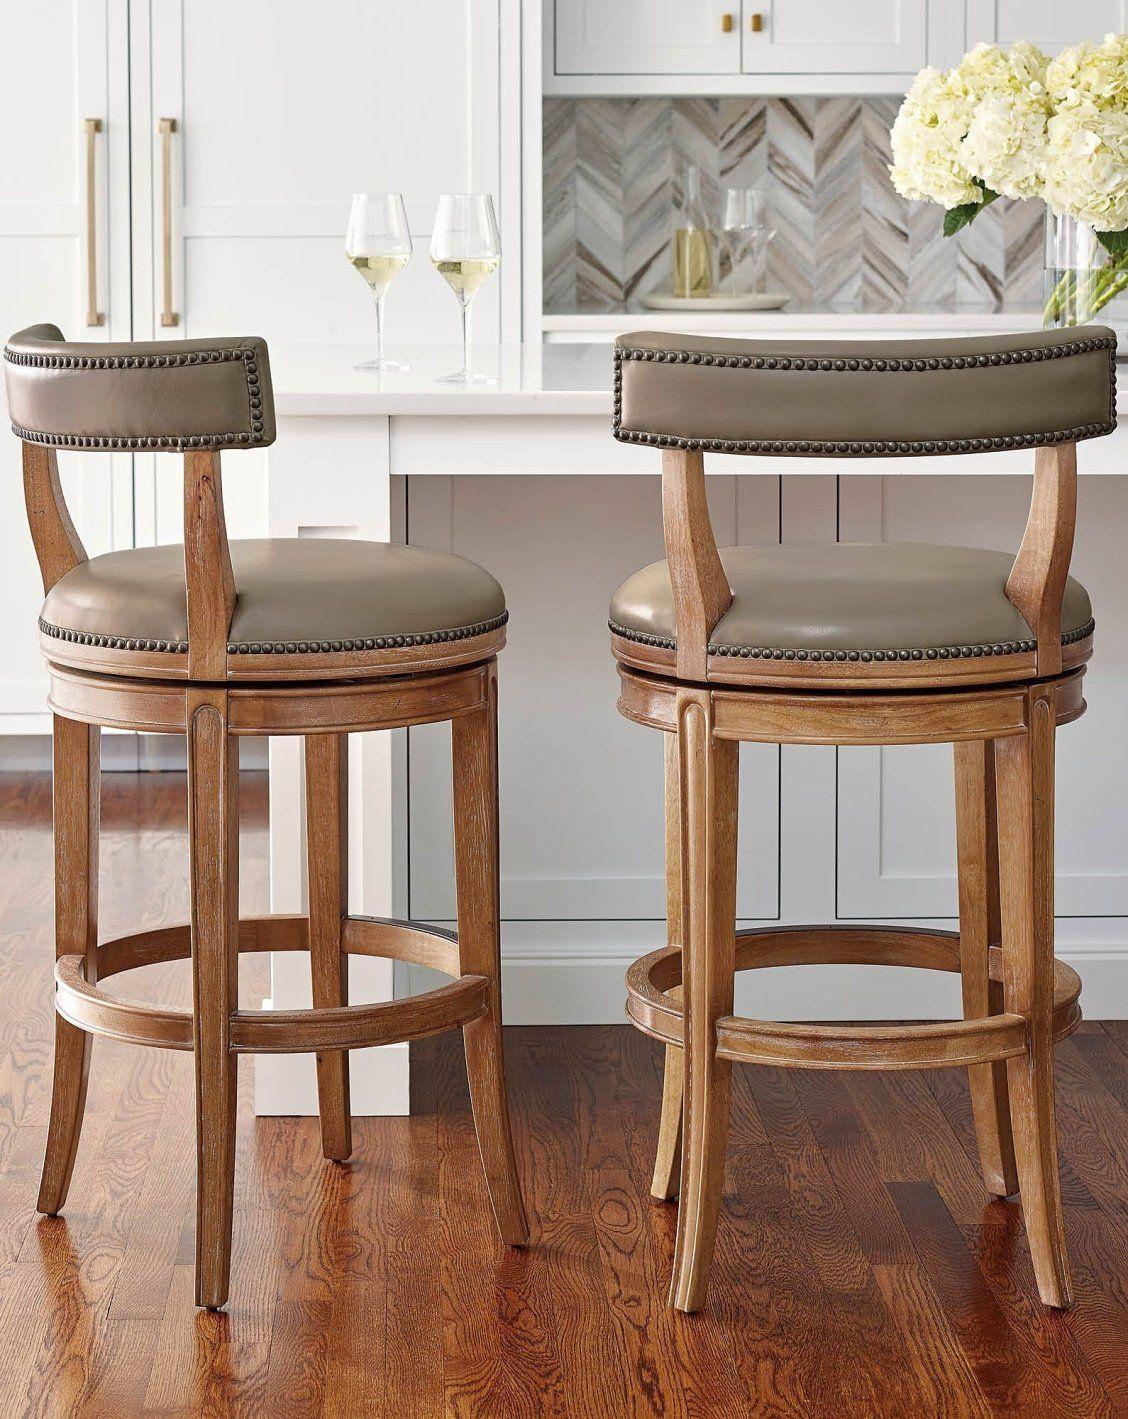 Henning Low Back Swivel Bar Counter Stool Frontgate In 2020 Counter Stools Swivel Counter Stools Indoor Furniture